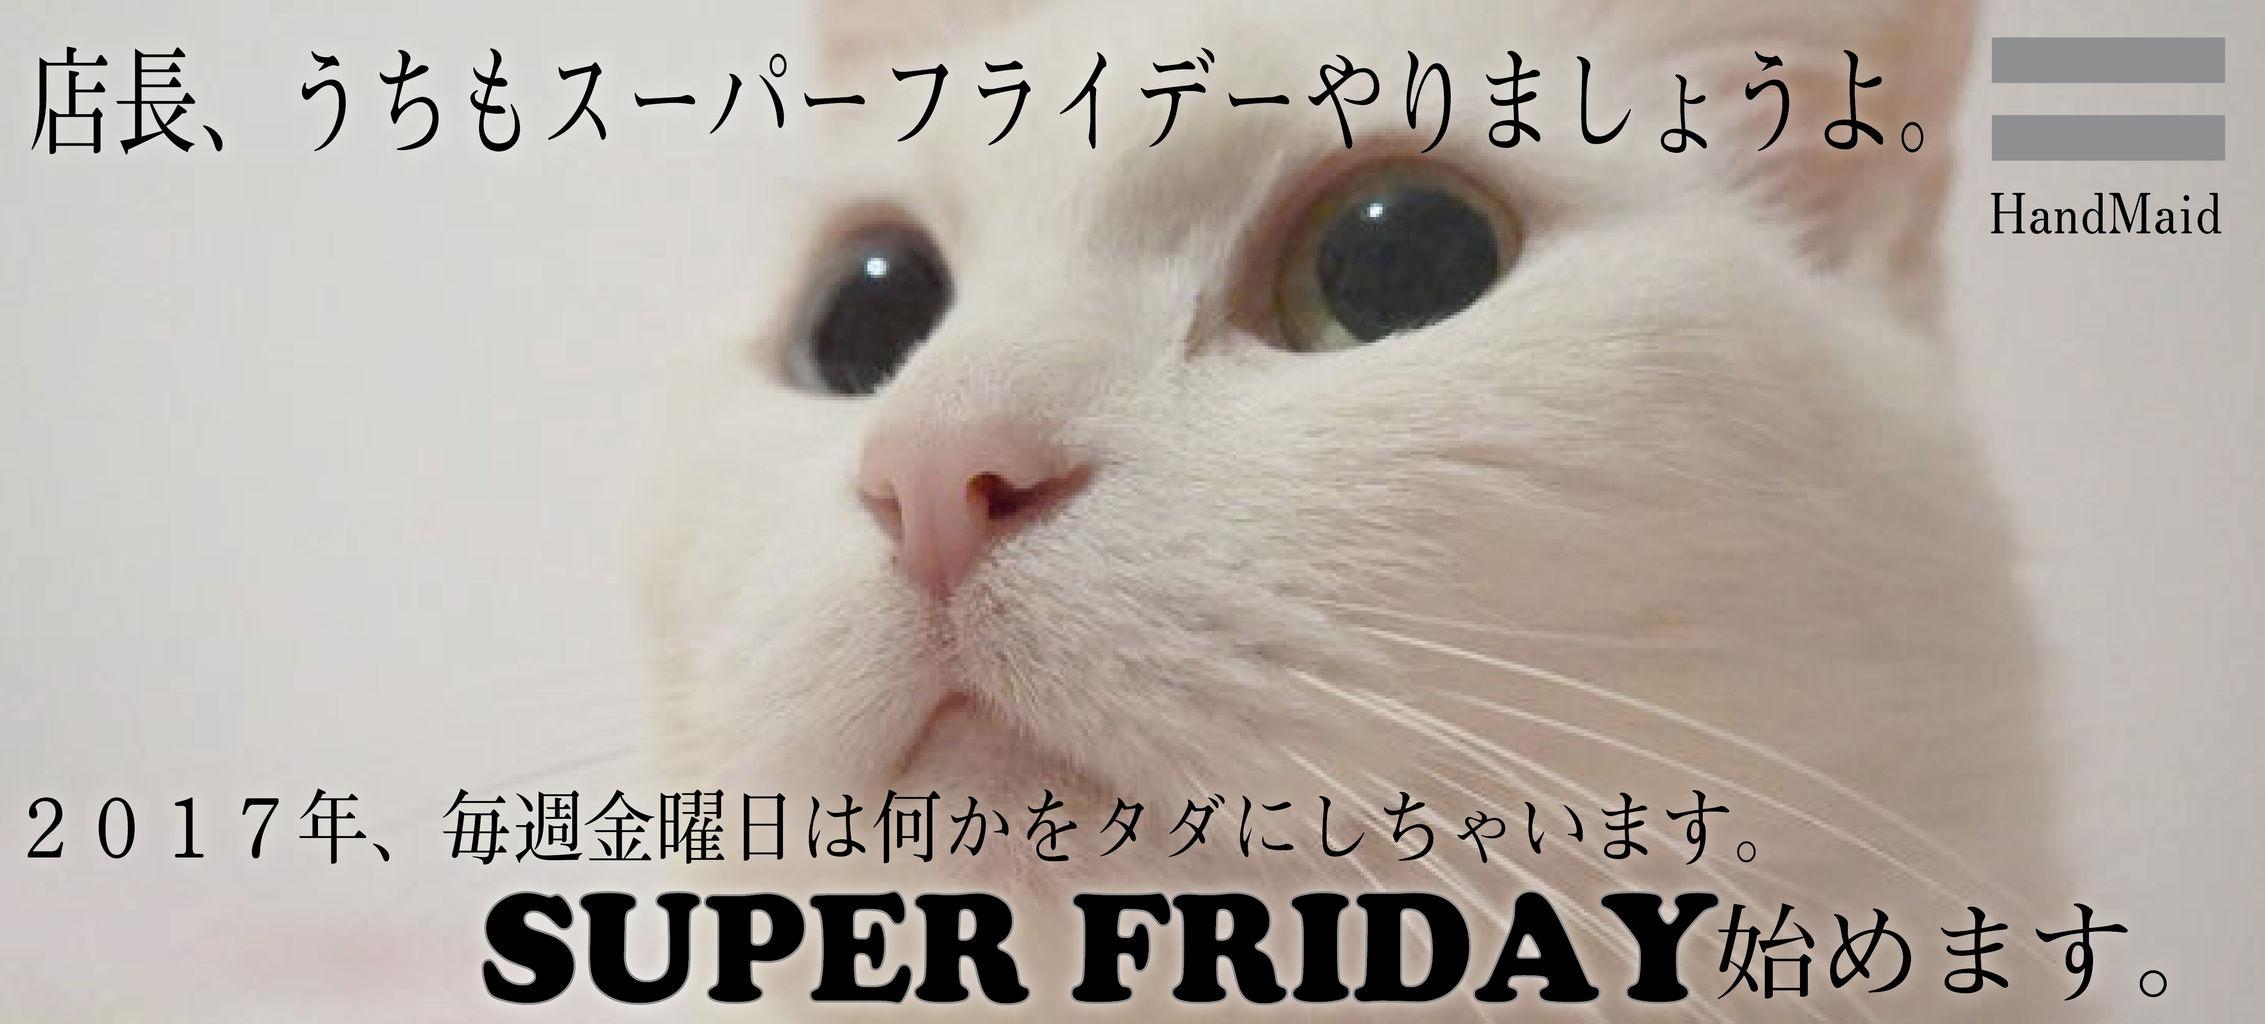 super friday